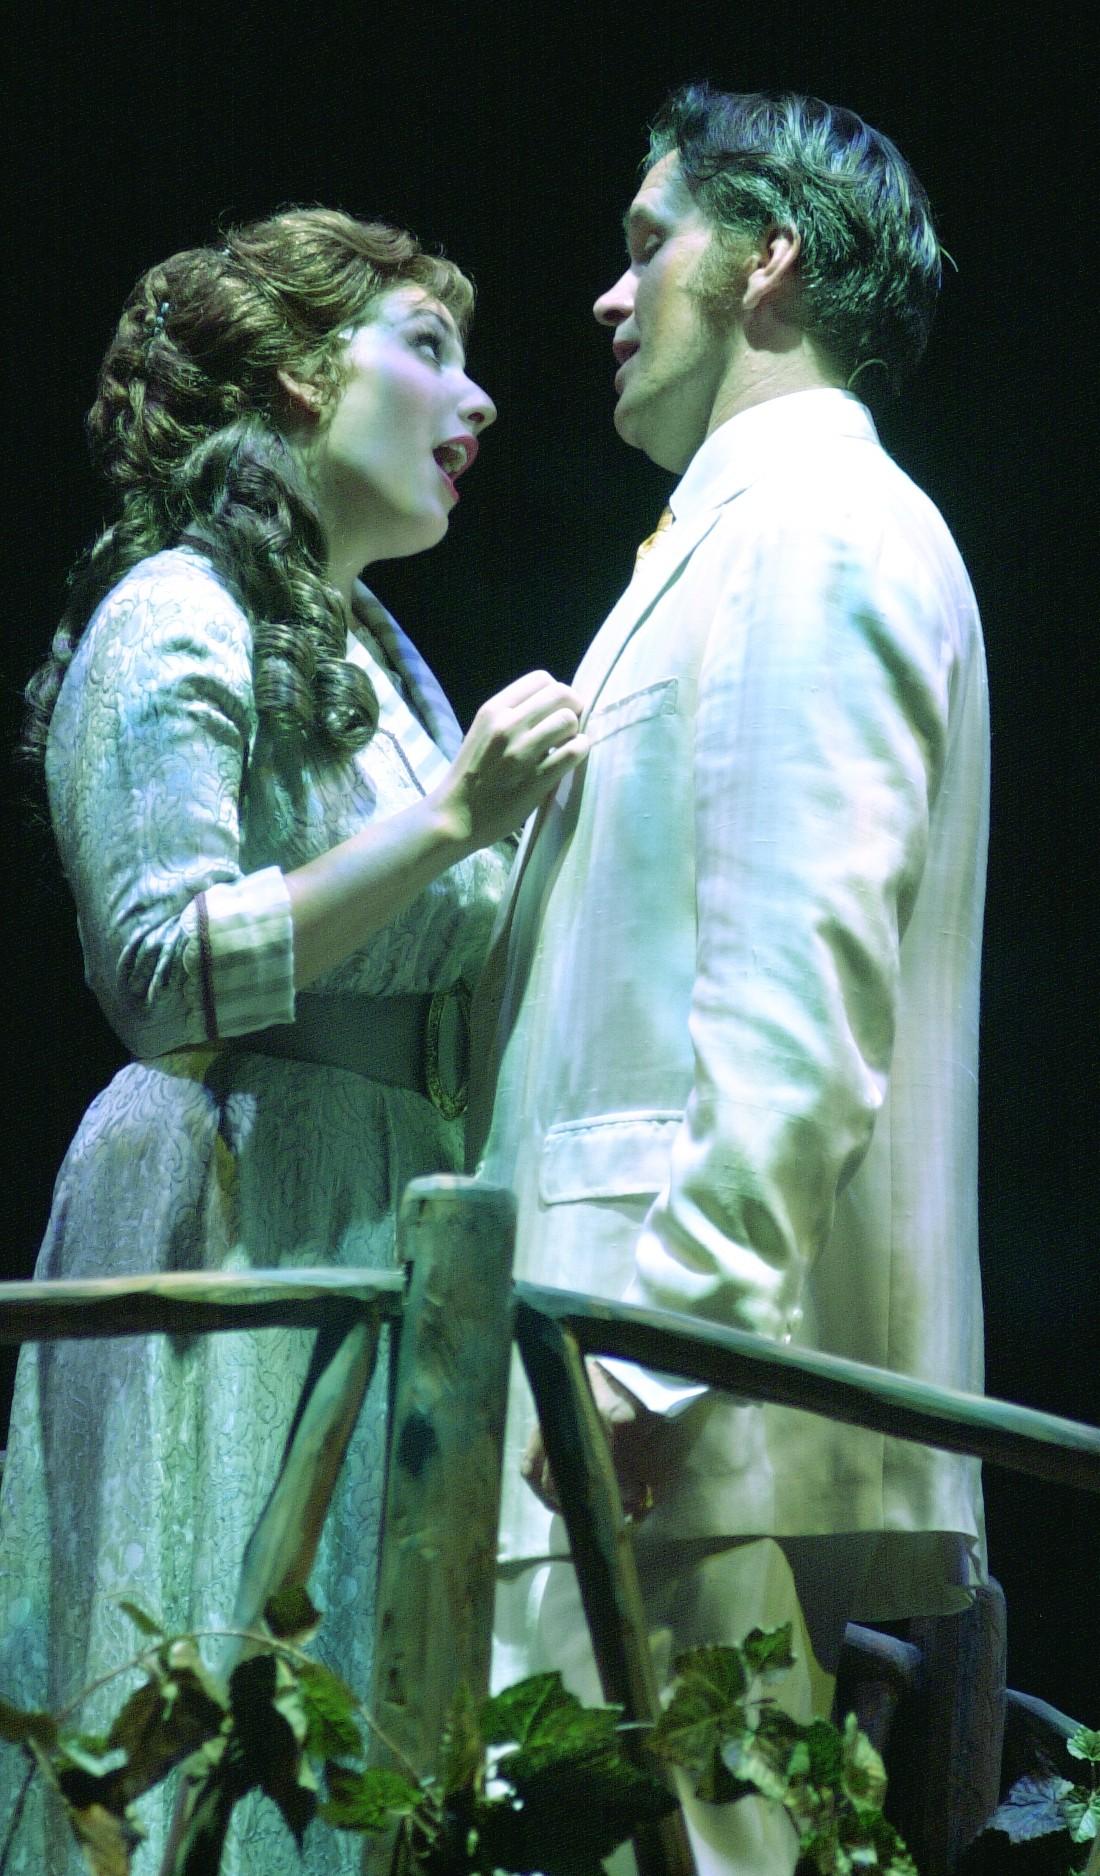 as Marian with George Dvorsky, The Music Man, Chautauqua Opera (photo by Roger Coda)